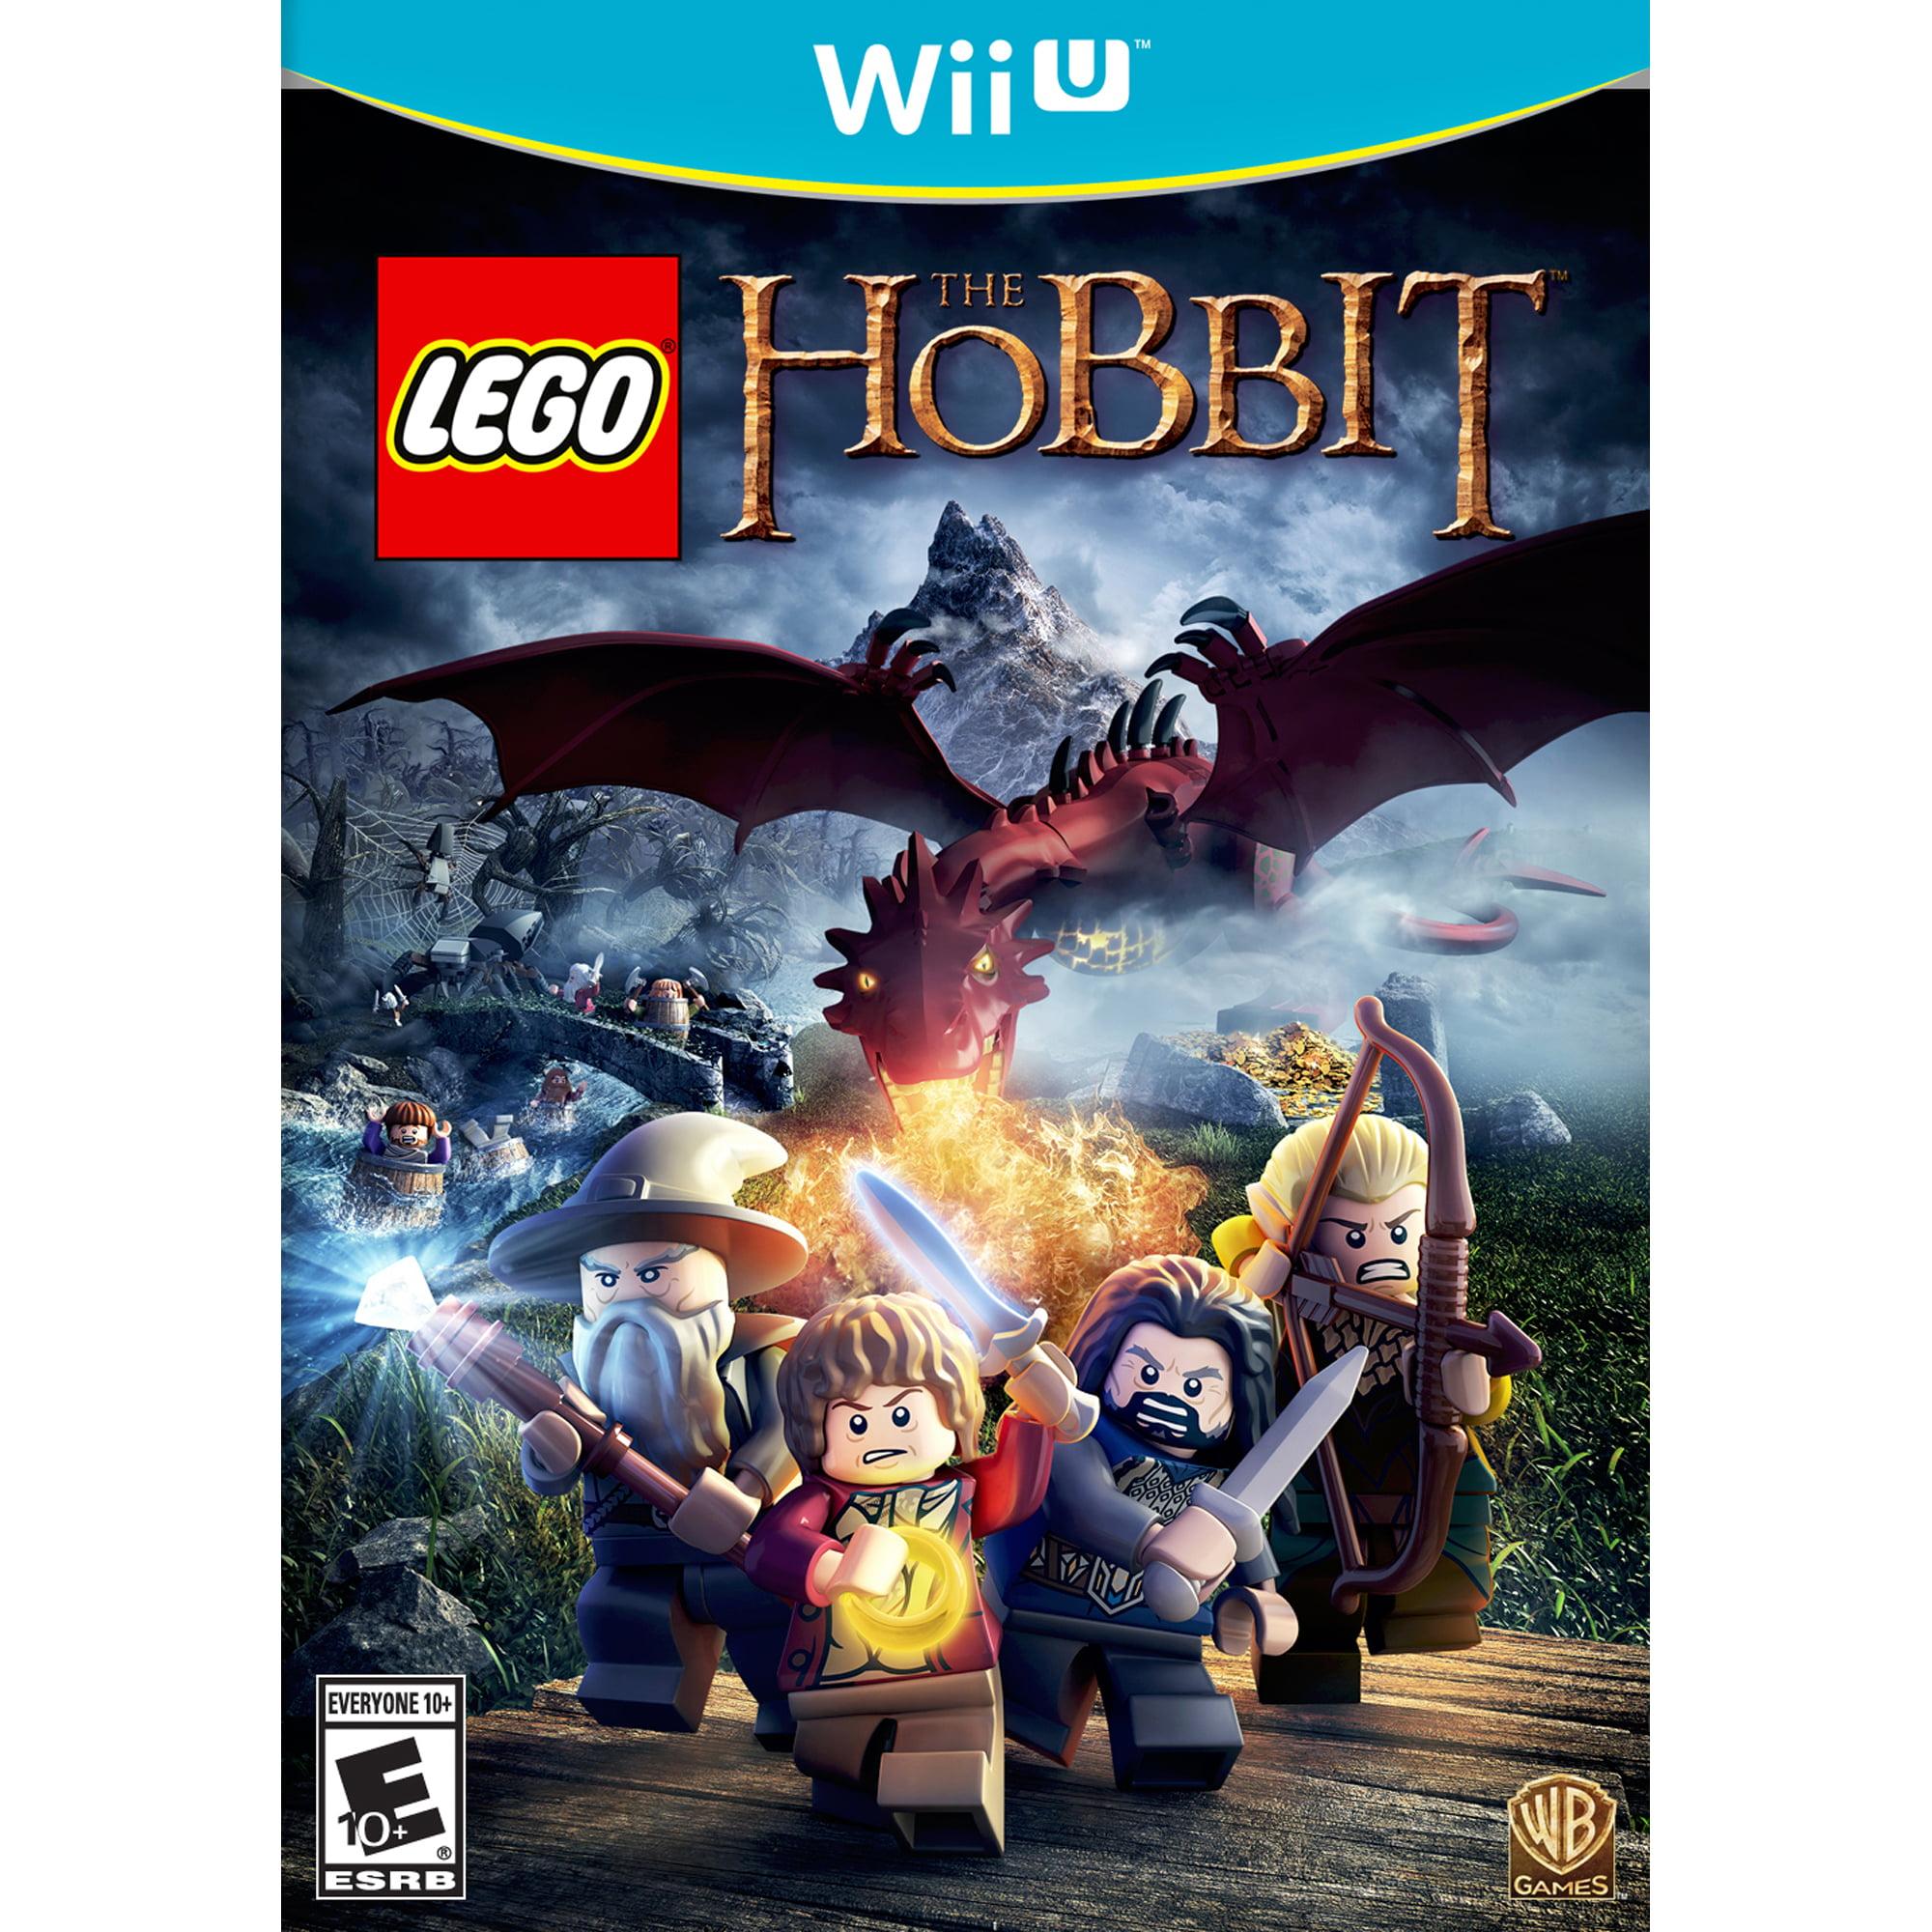 LEGO The Hobbit, WHV Games, Nintendo Wii U, 883929399215